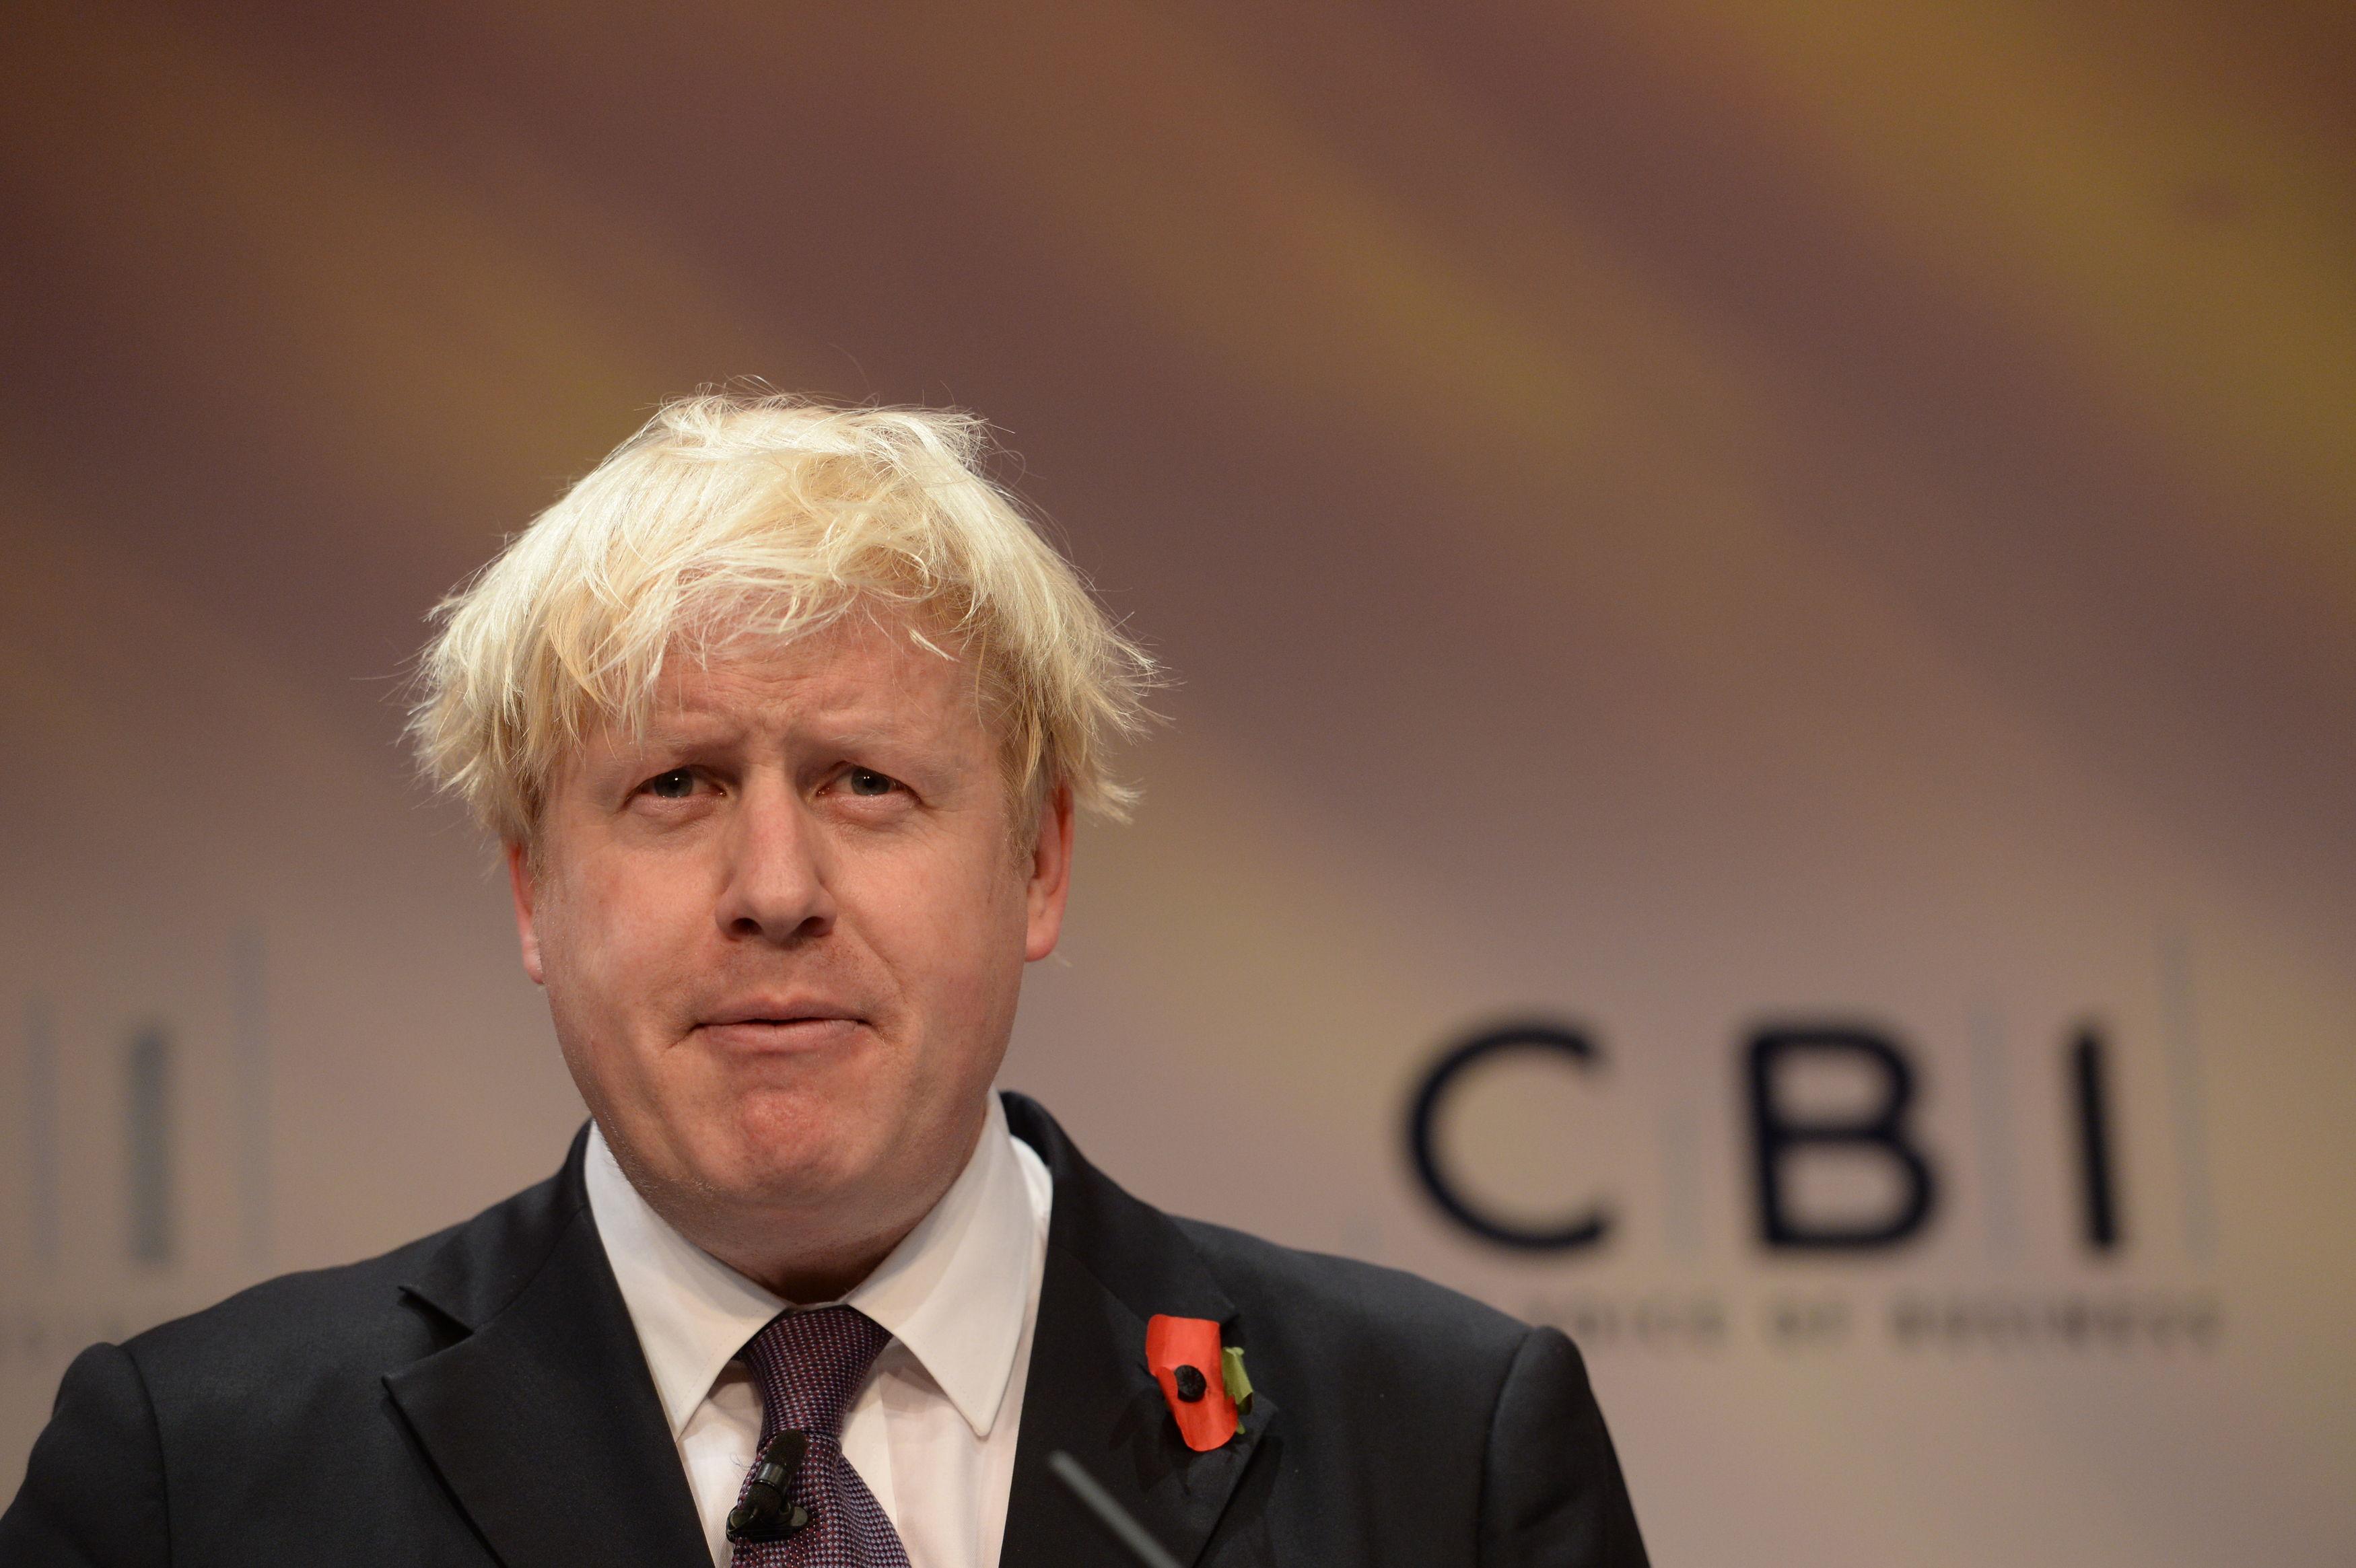 Mayor of London Boris Johnson addresses the CBI Annual conference in London.